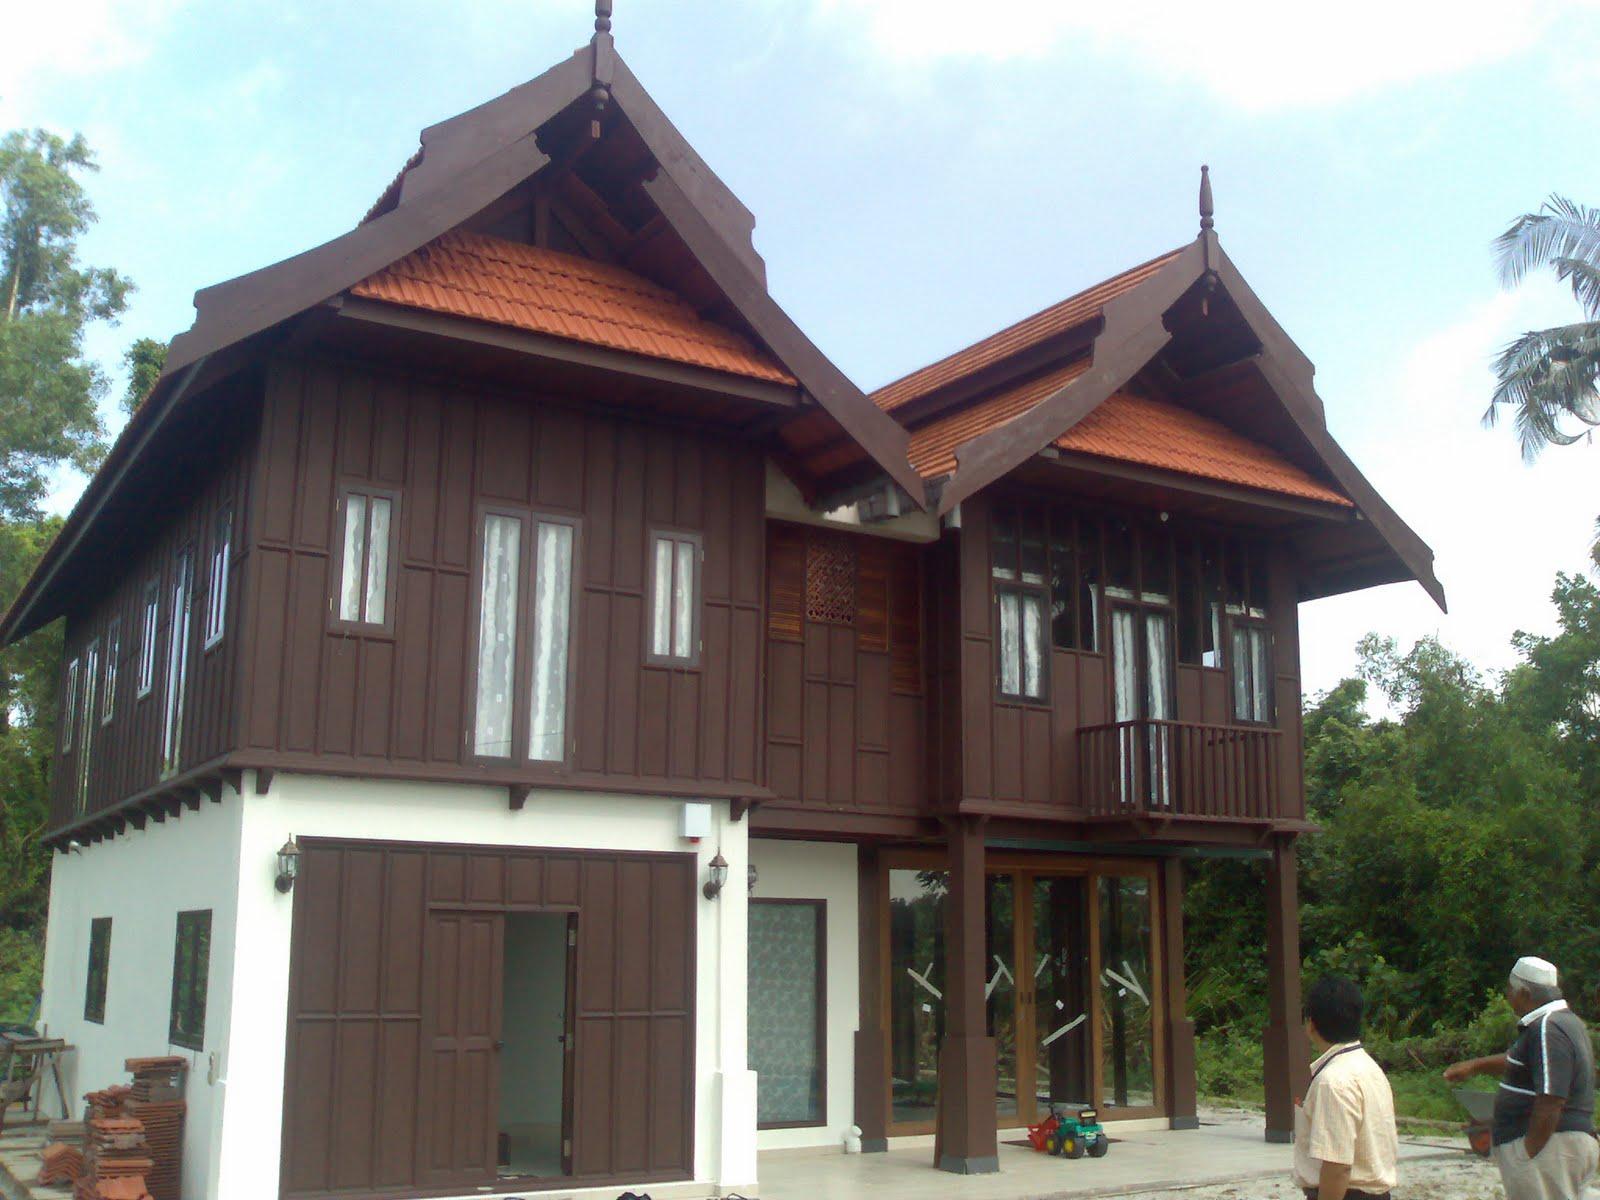 Rumah Melayu Tradisional Terengganu Moden